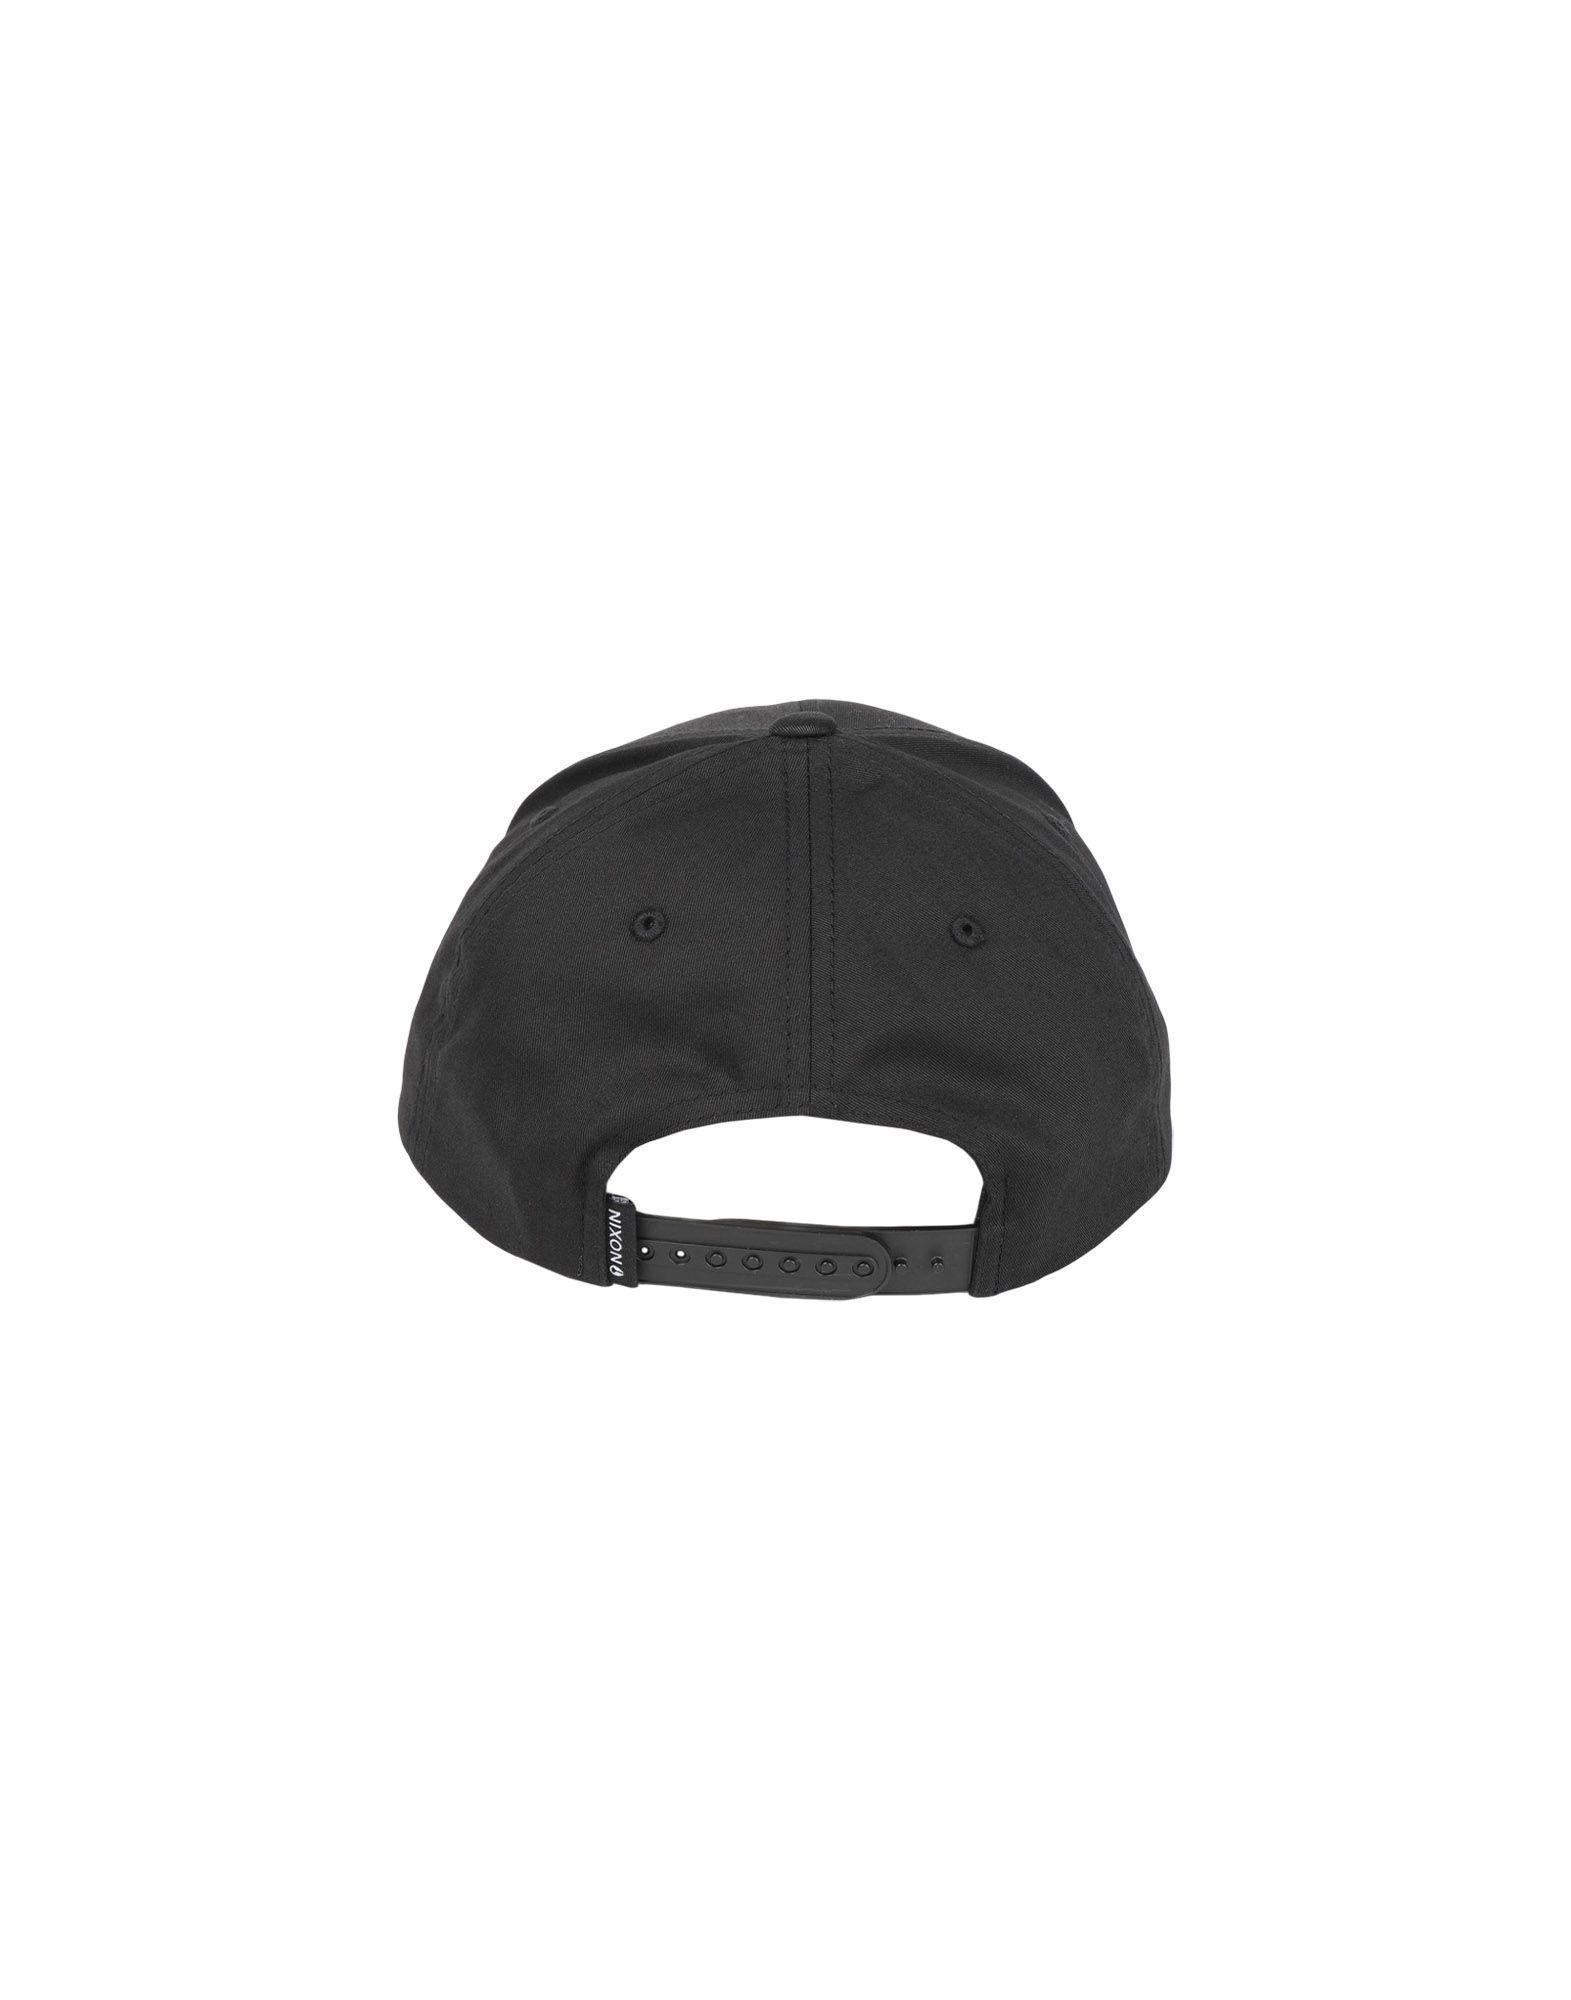 Lyst - Nixon Hat in Black for Men 8fc02f7ae6cc